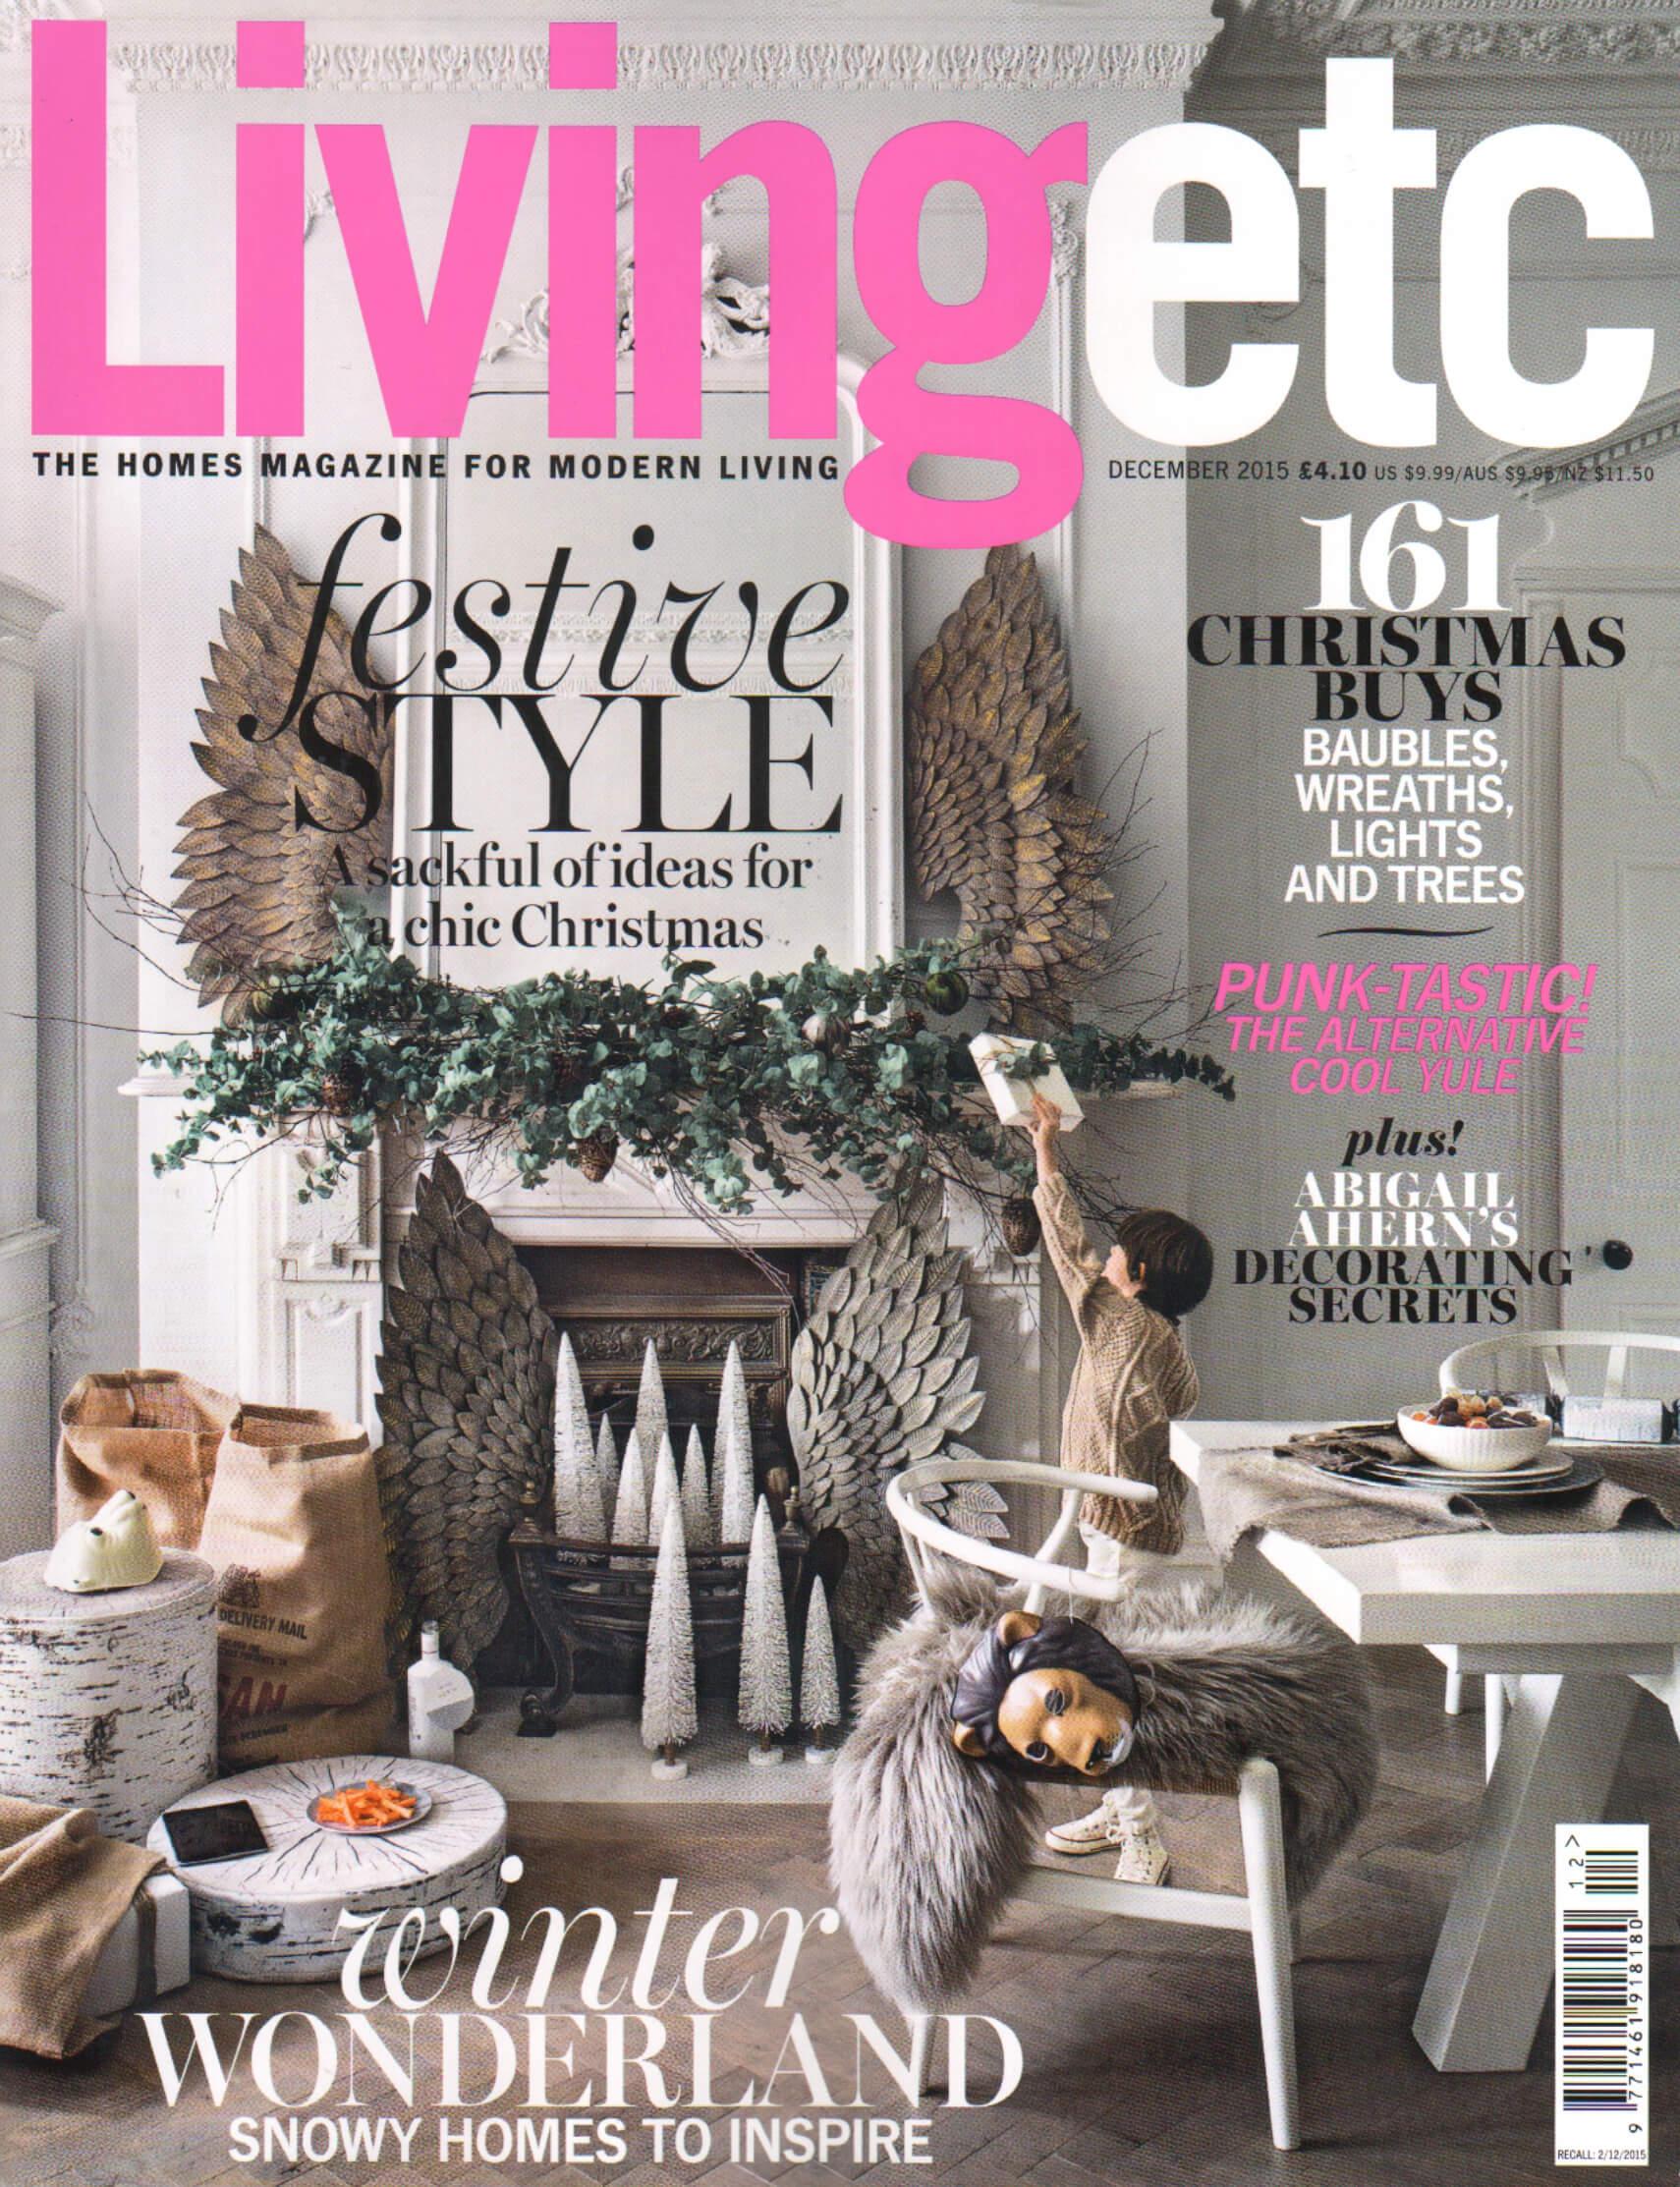 LivingEtcDec2015